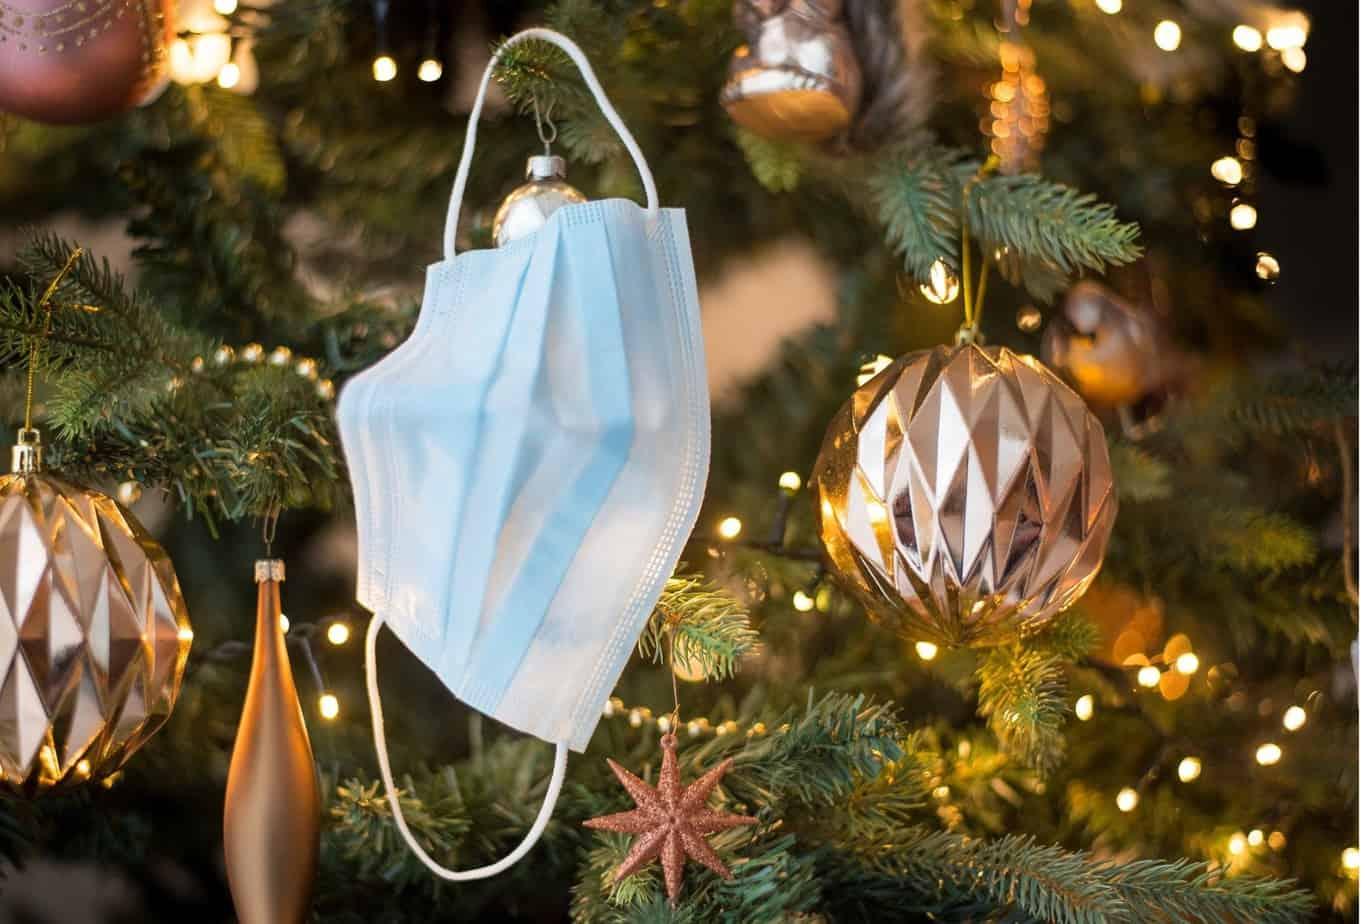 Cancel Christmas? No. The world needs hope!